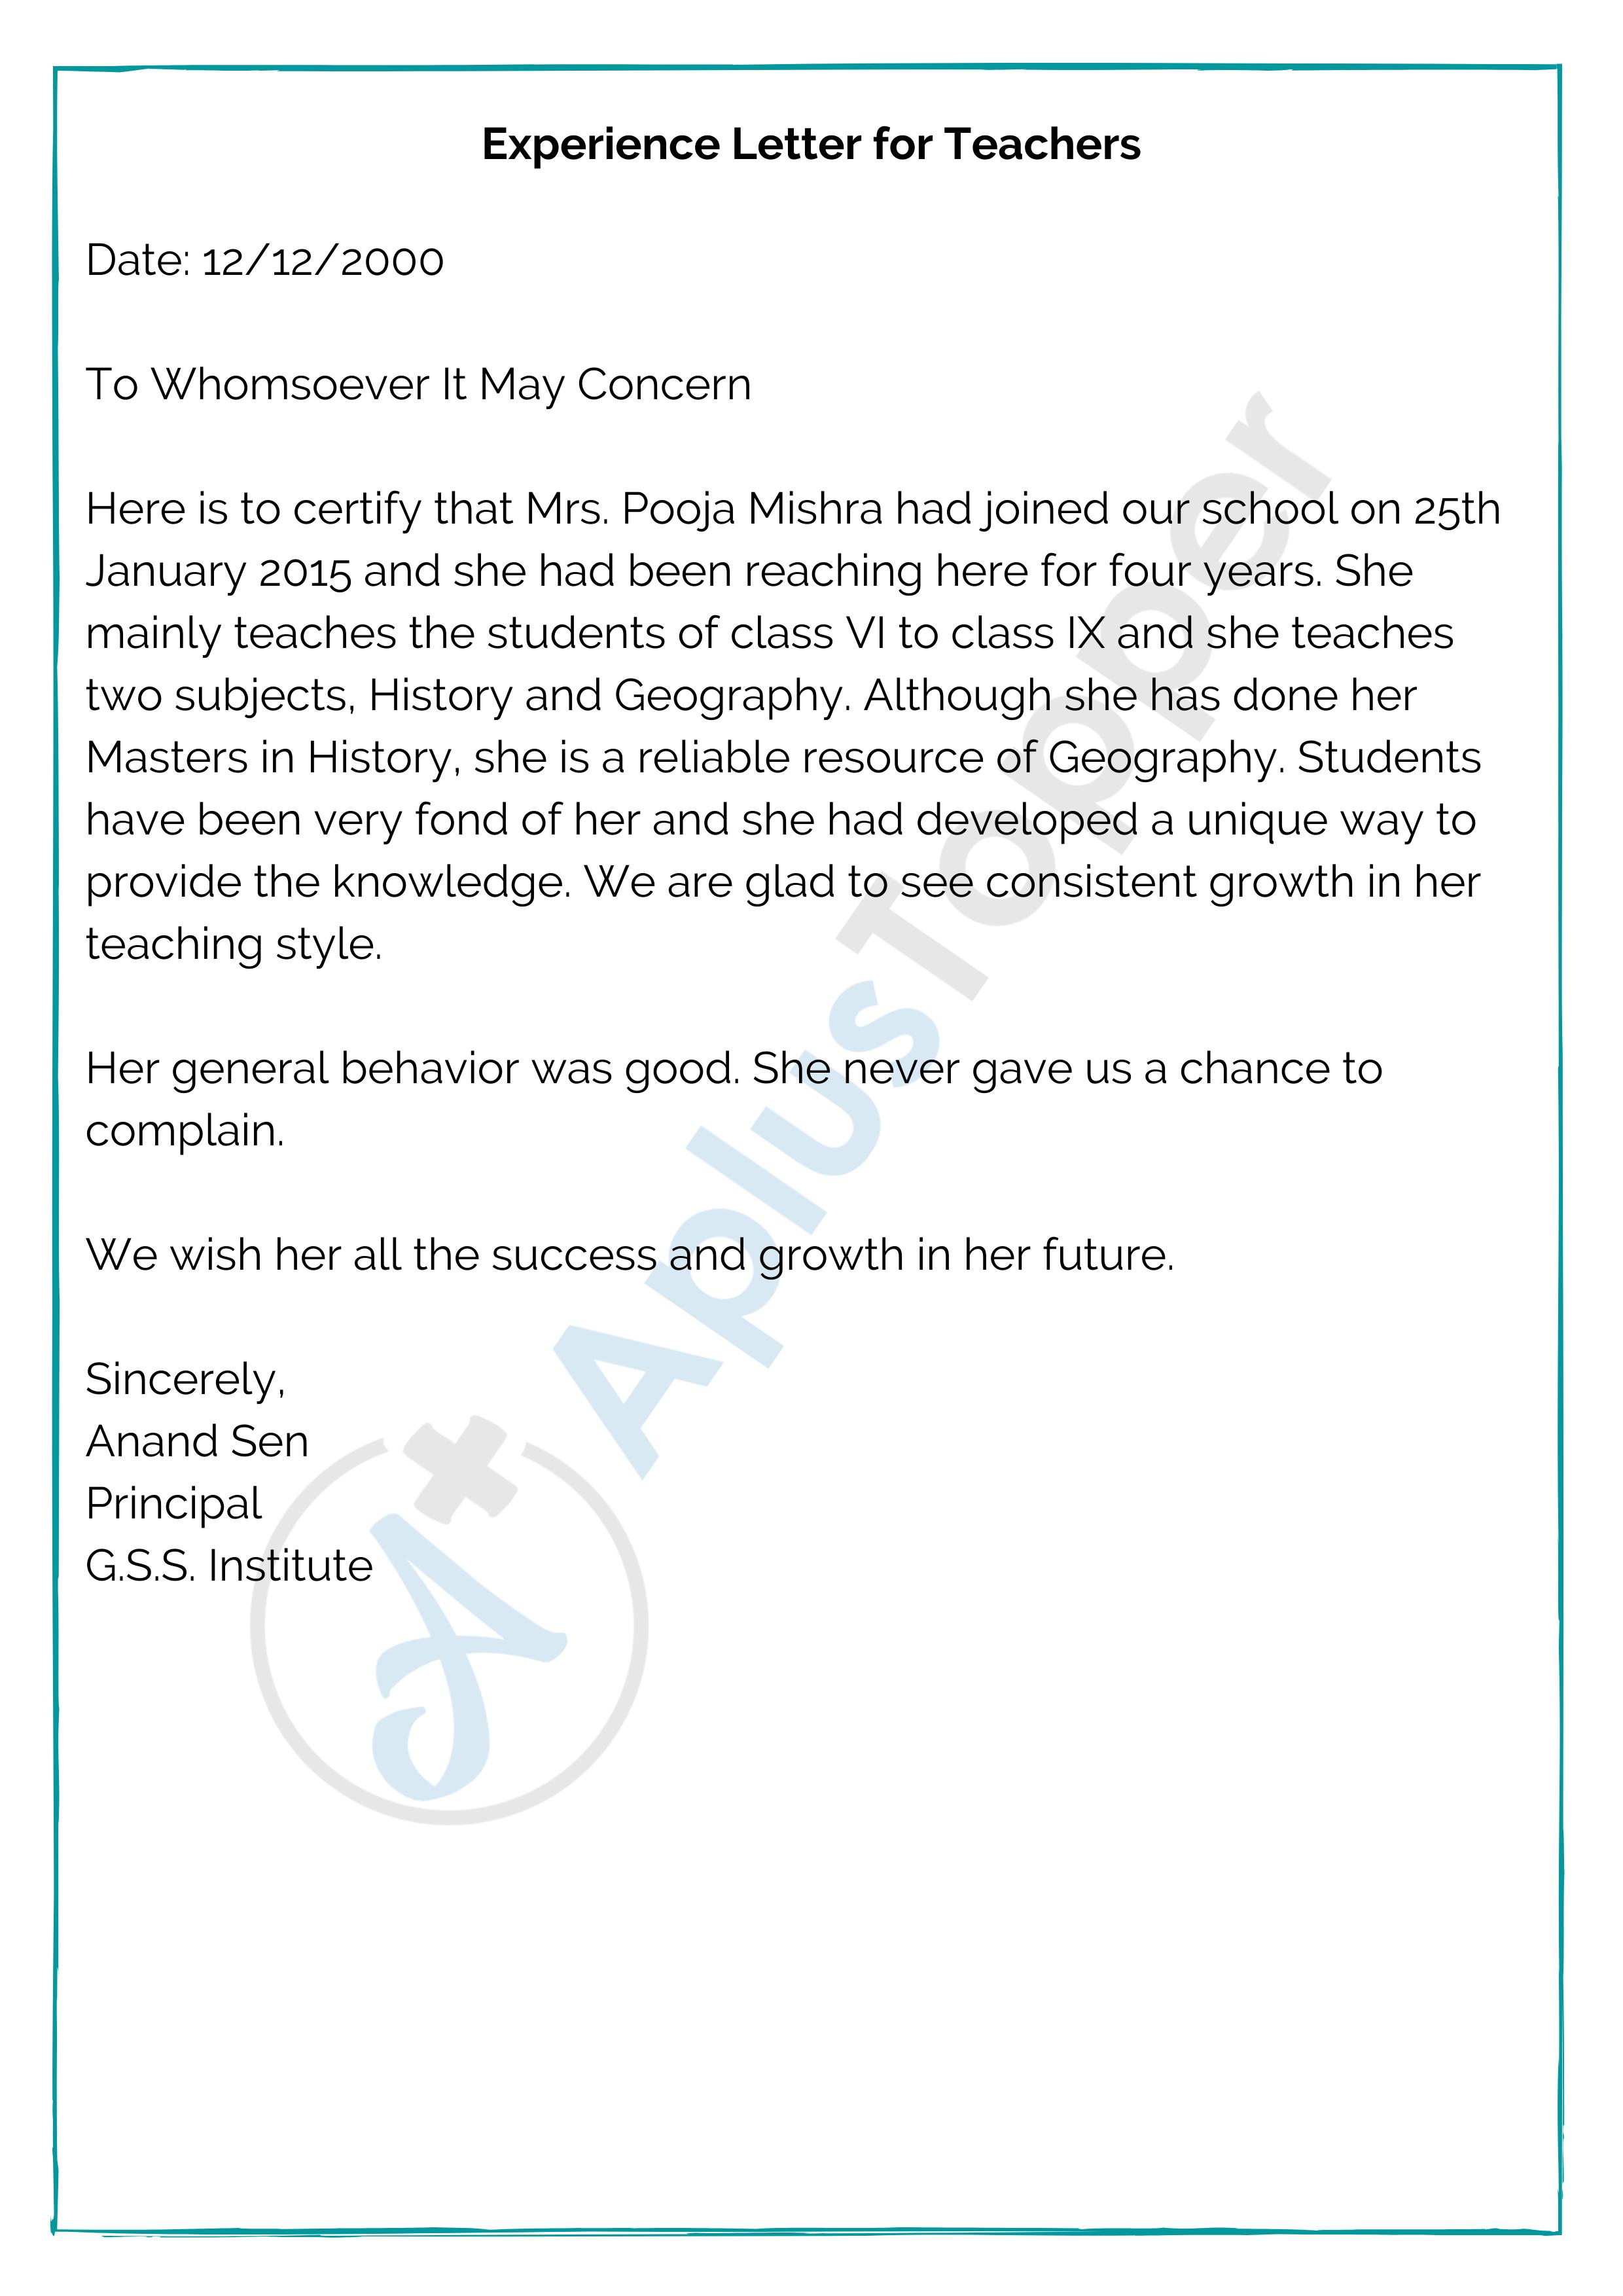 Experience Letter for Teachers